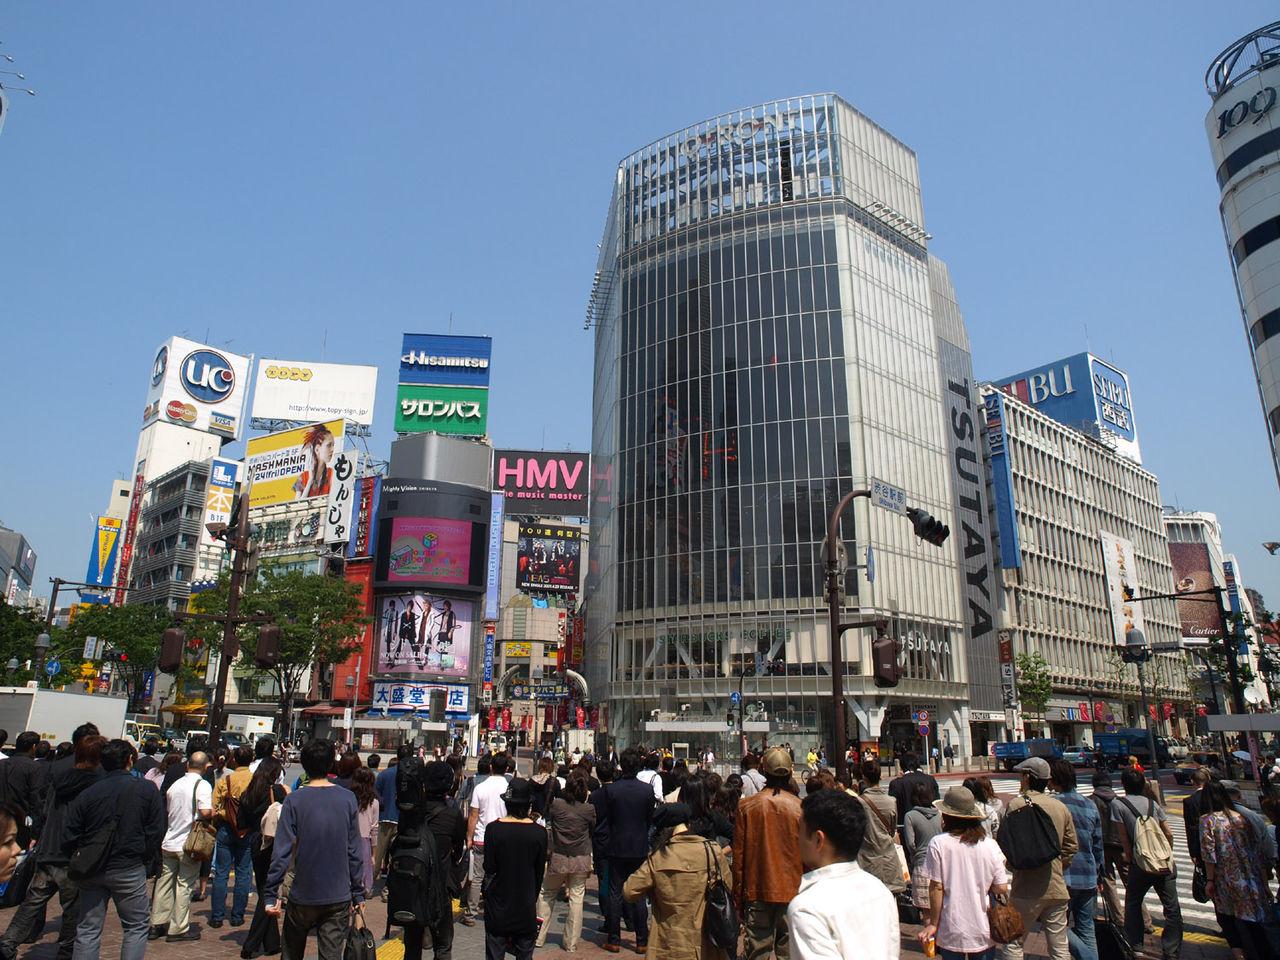 HMVが5年ぶりに渋谷に復活(HMV渋谷店の思い出) : 知られざる佳曲